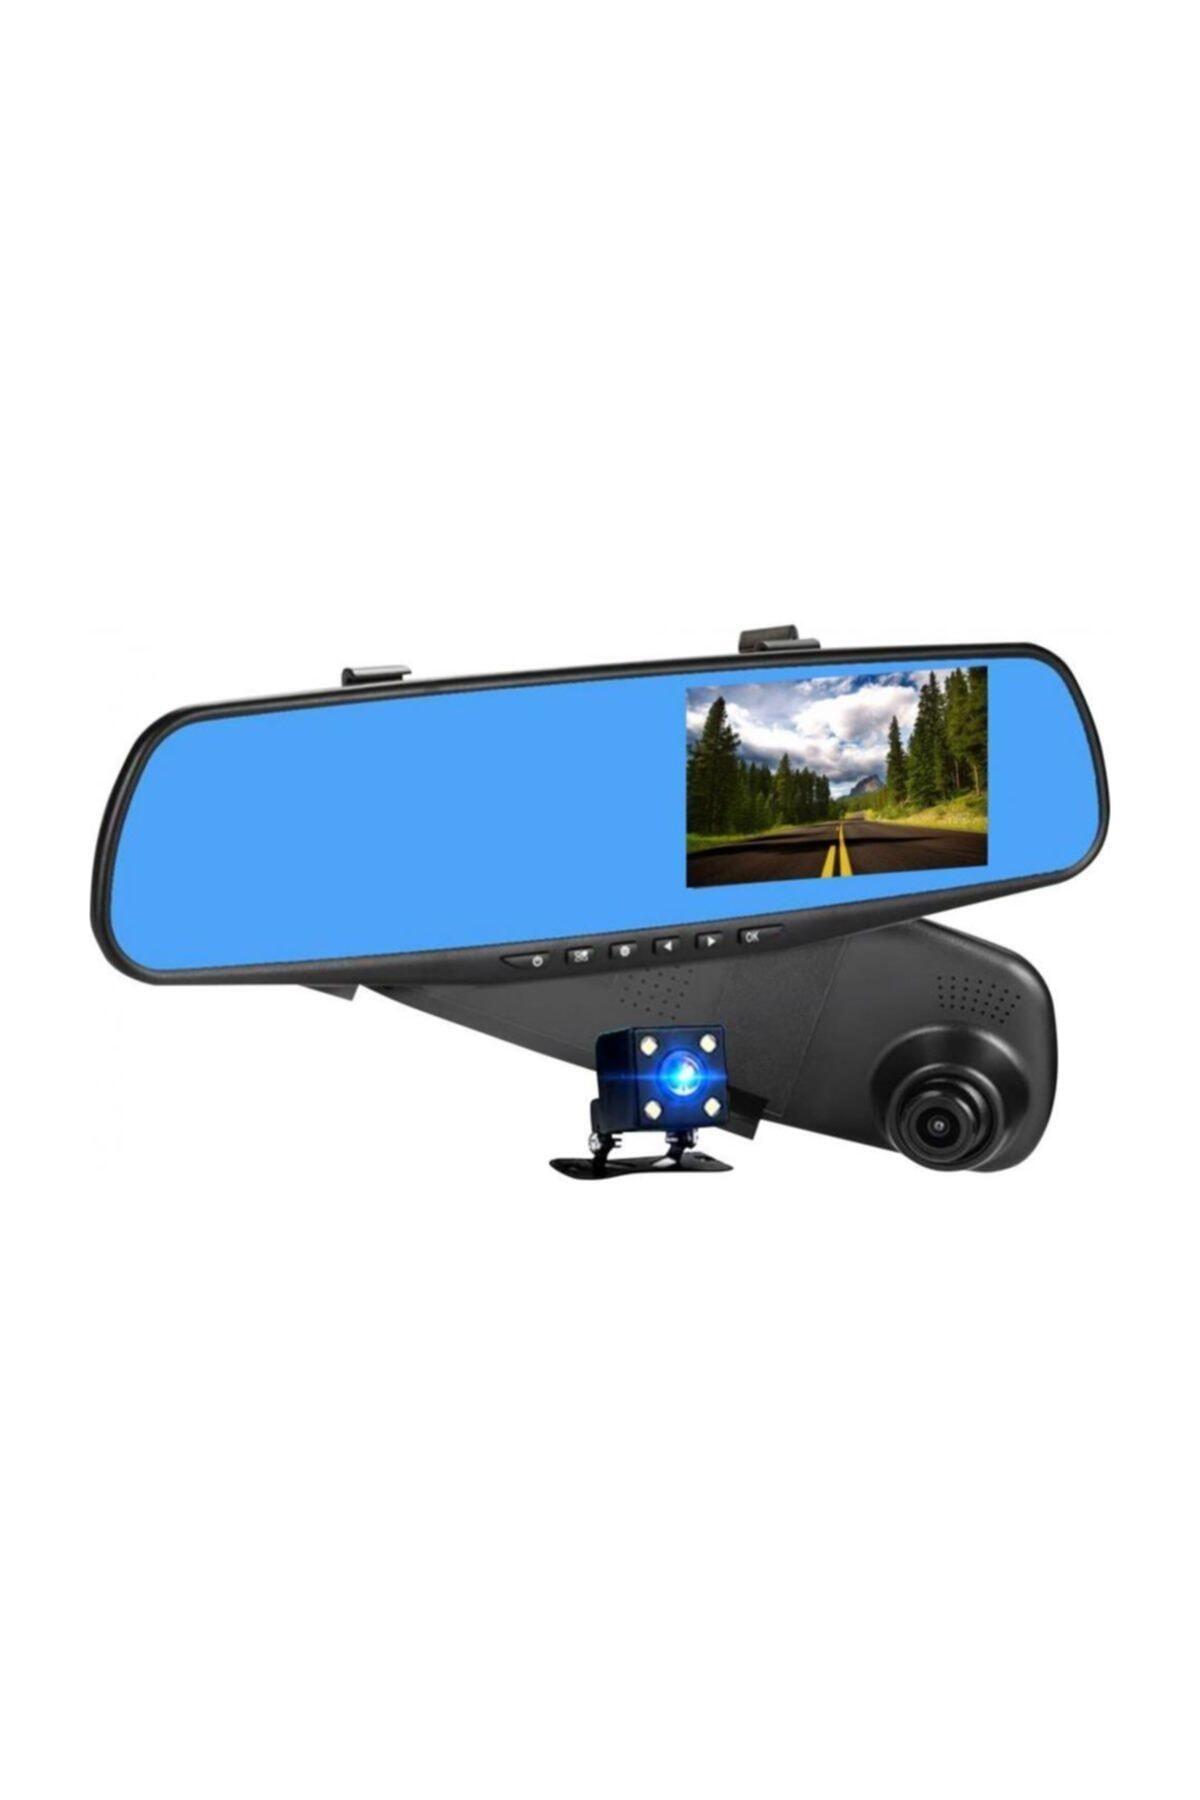 Concord Araç Içi Dikiz Ayna Kamerası 4.3 Inç Çift Kamera Türkçe 1080p 1